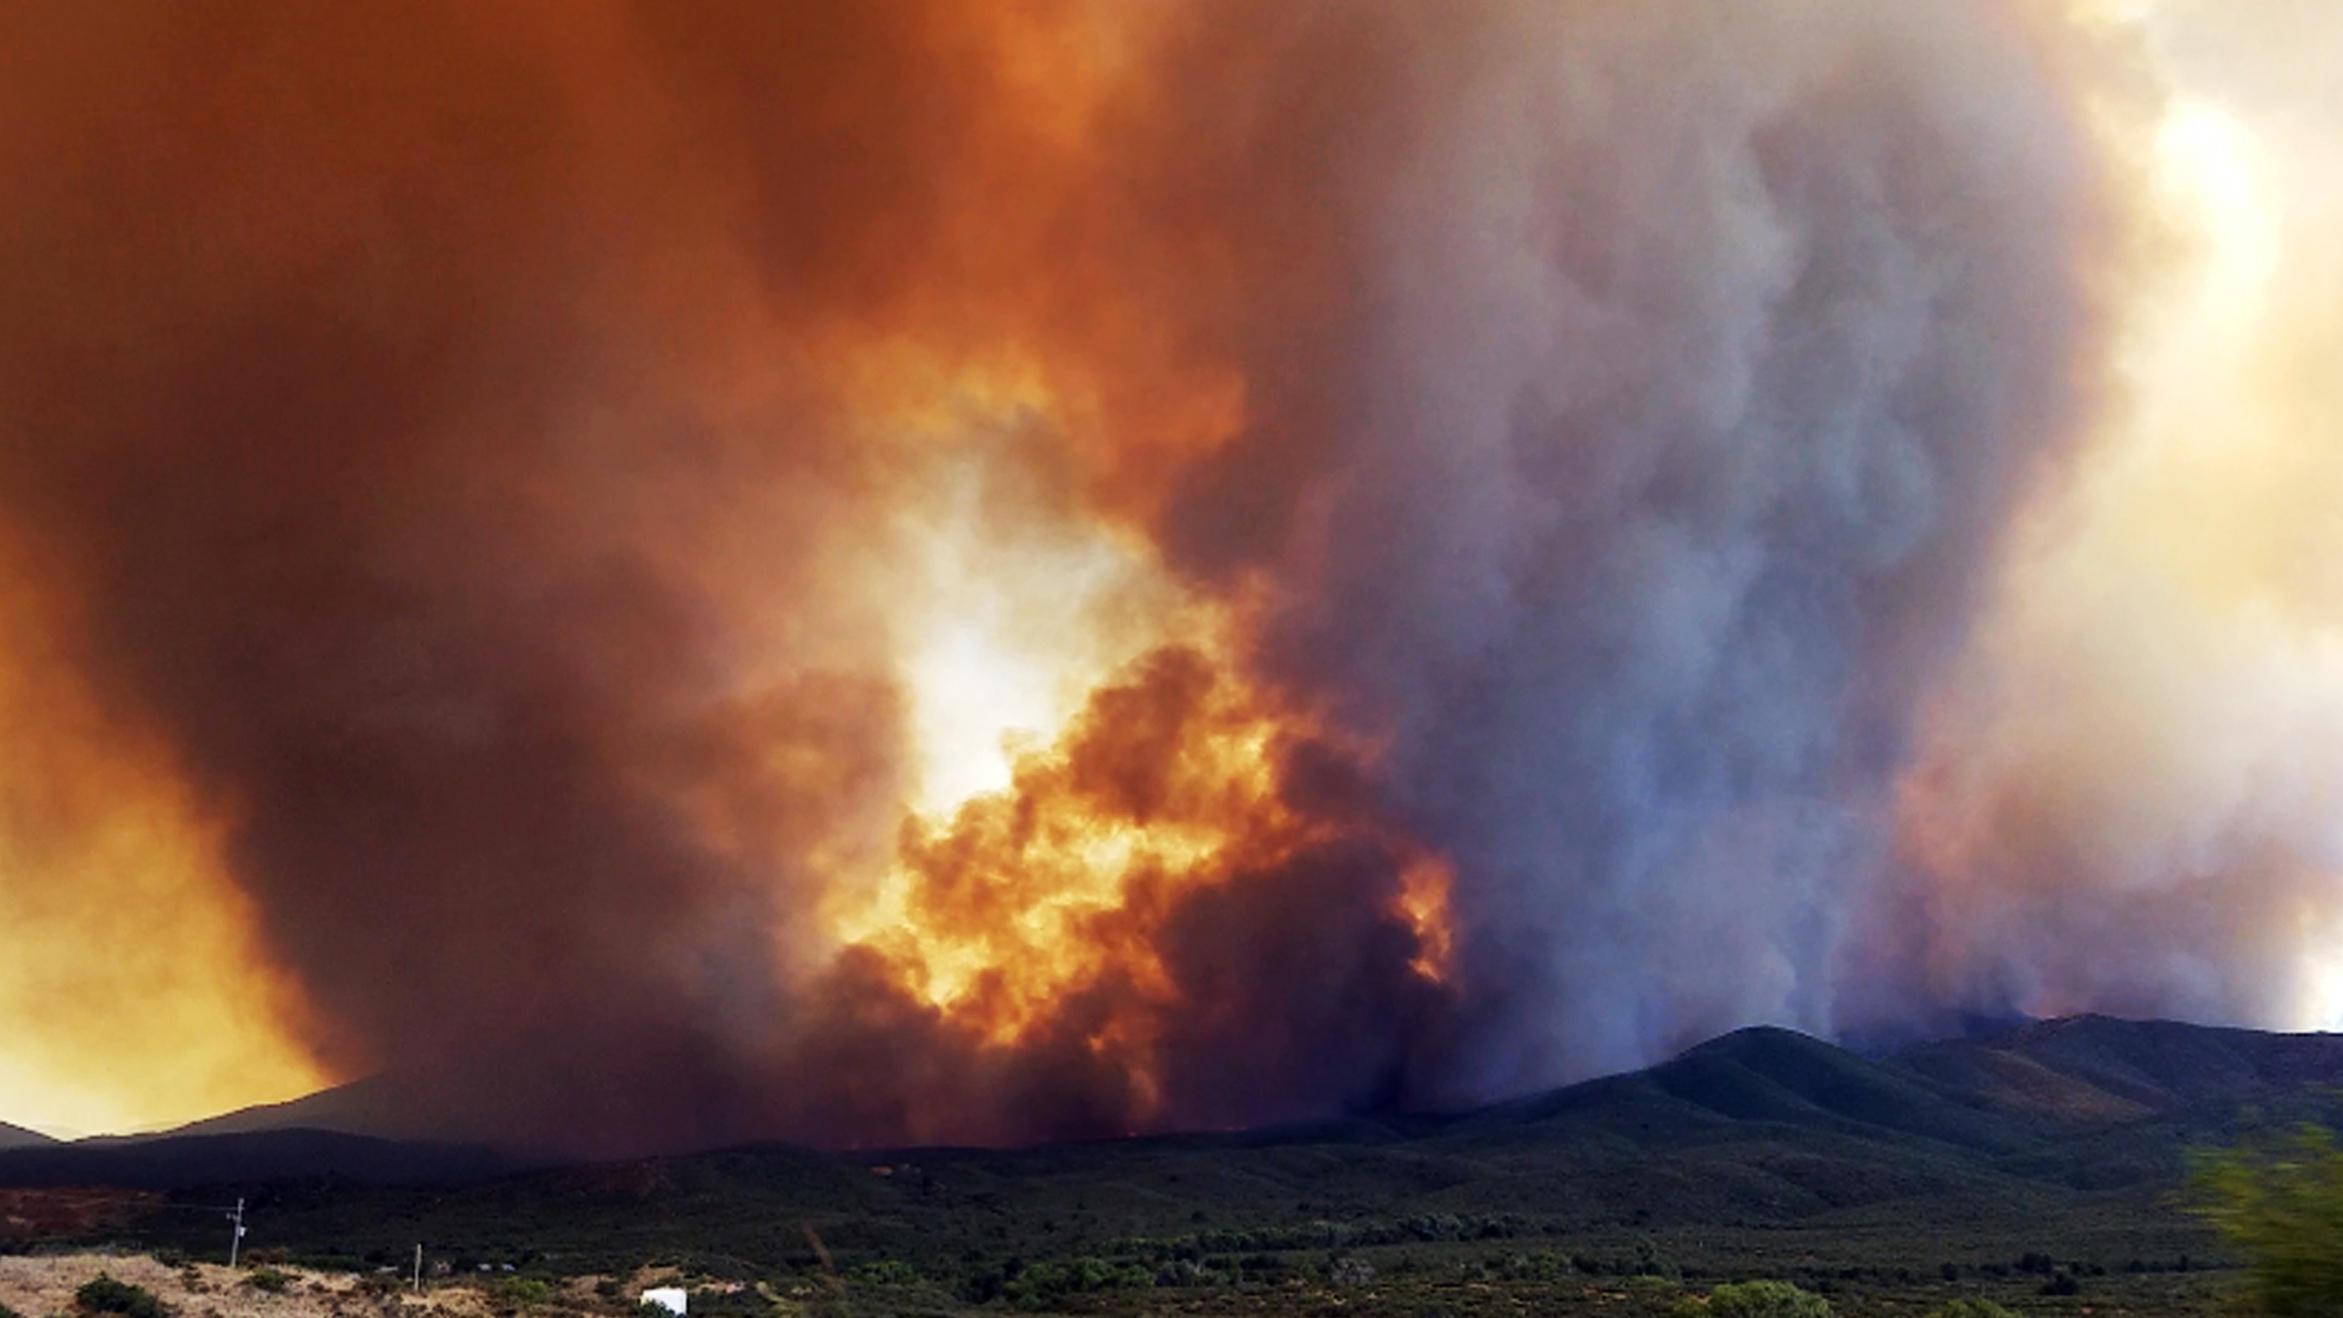 Goodwin fire map shows intensity of blaze consuming Prescott area